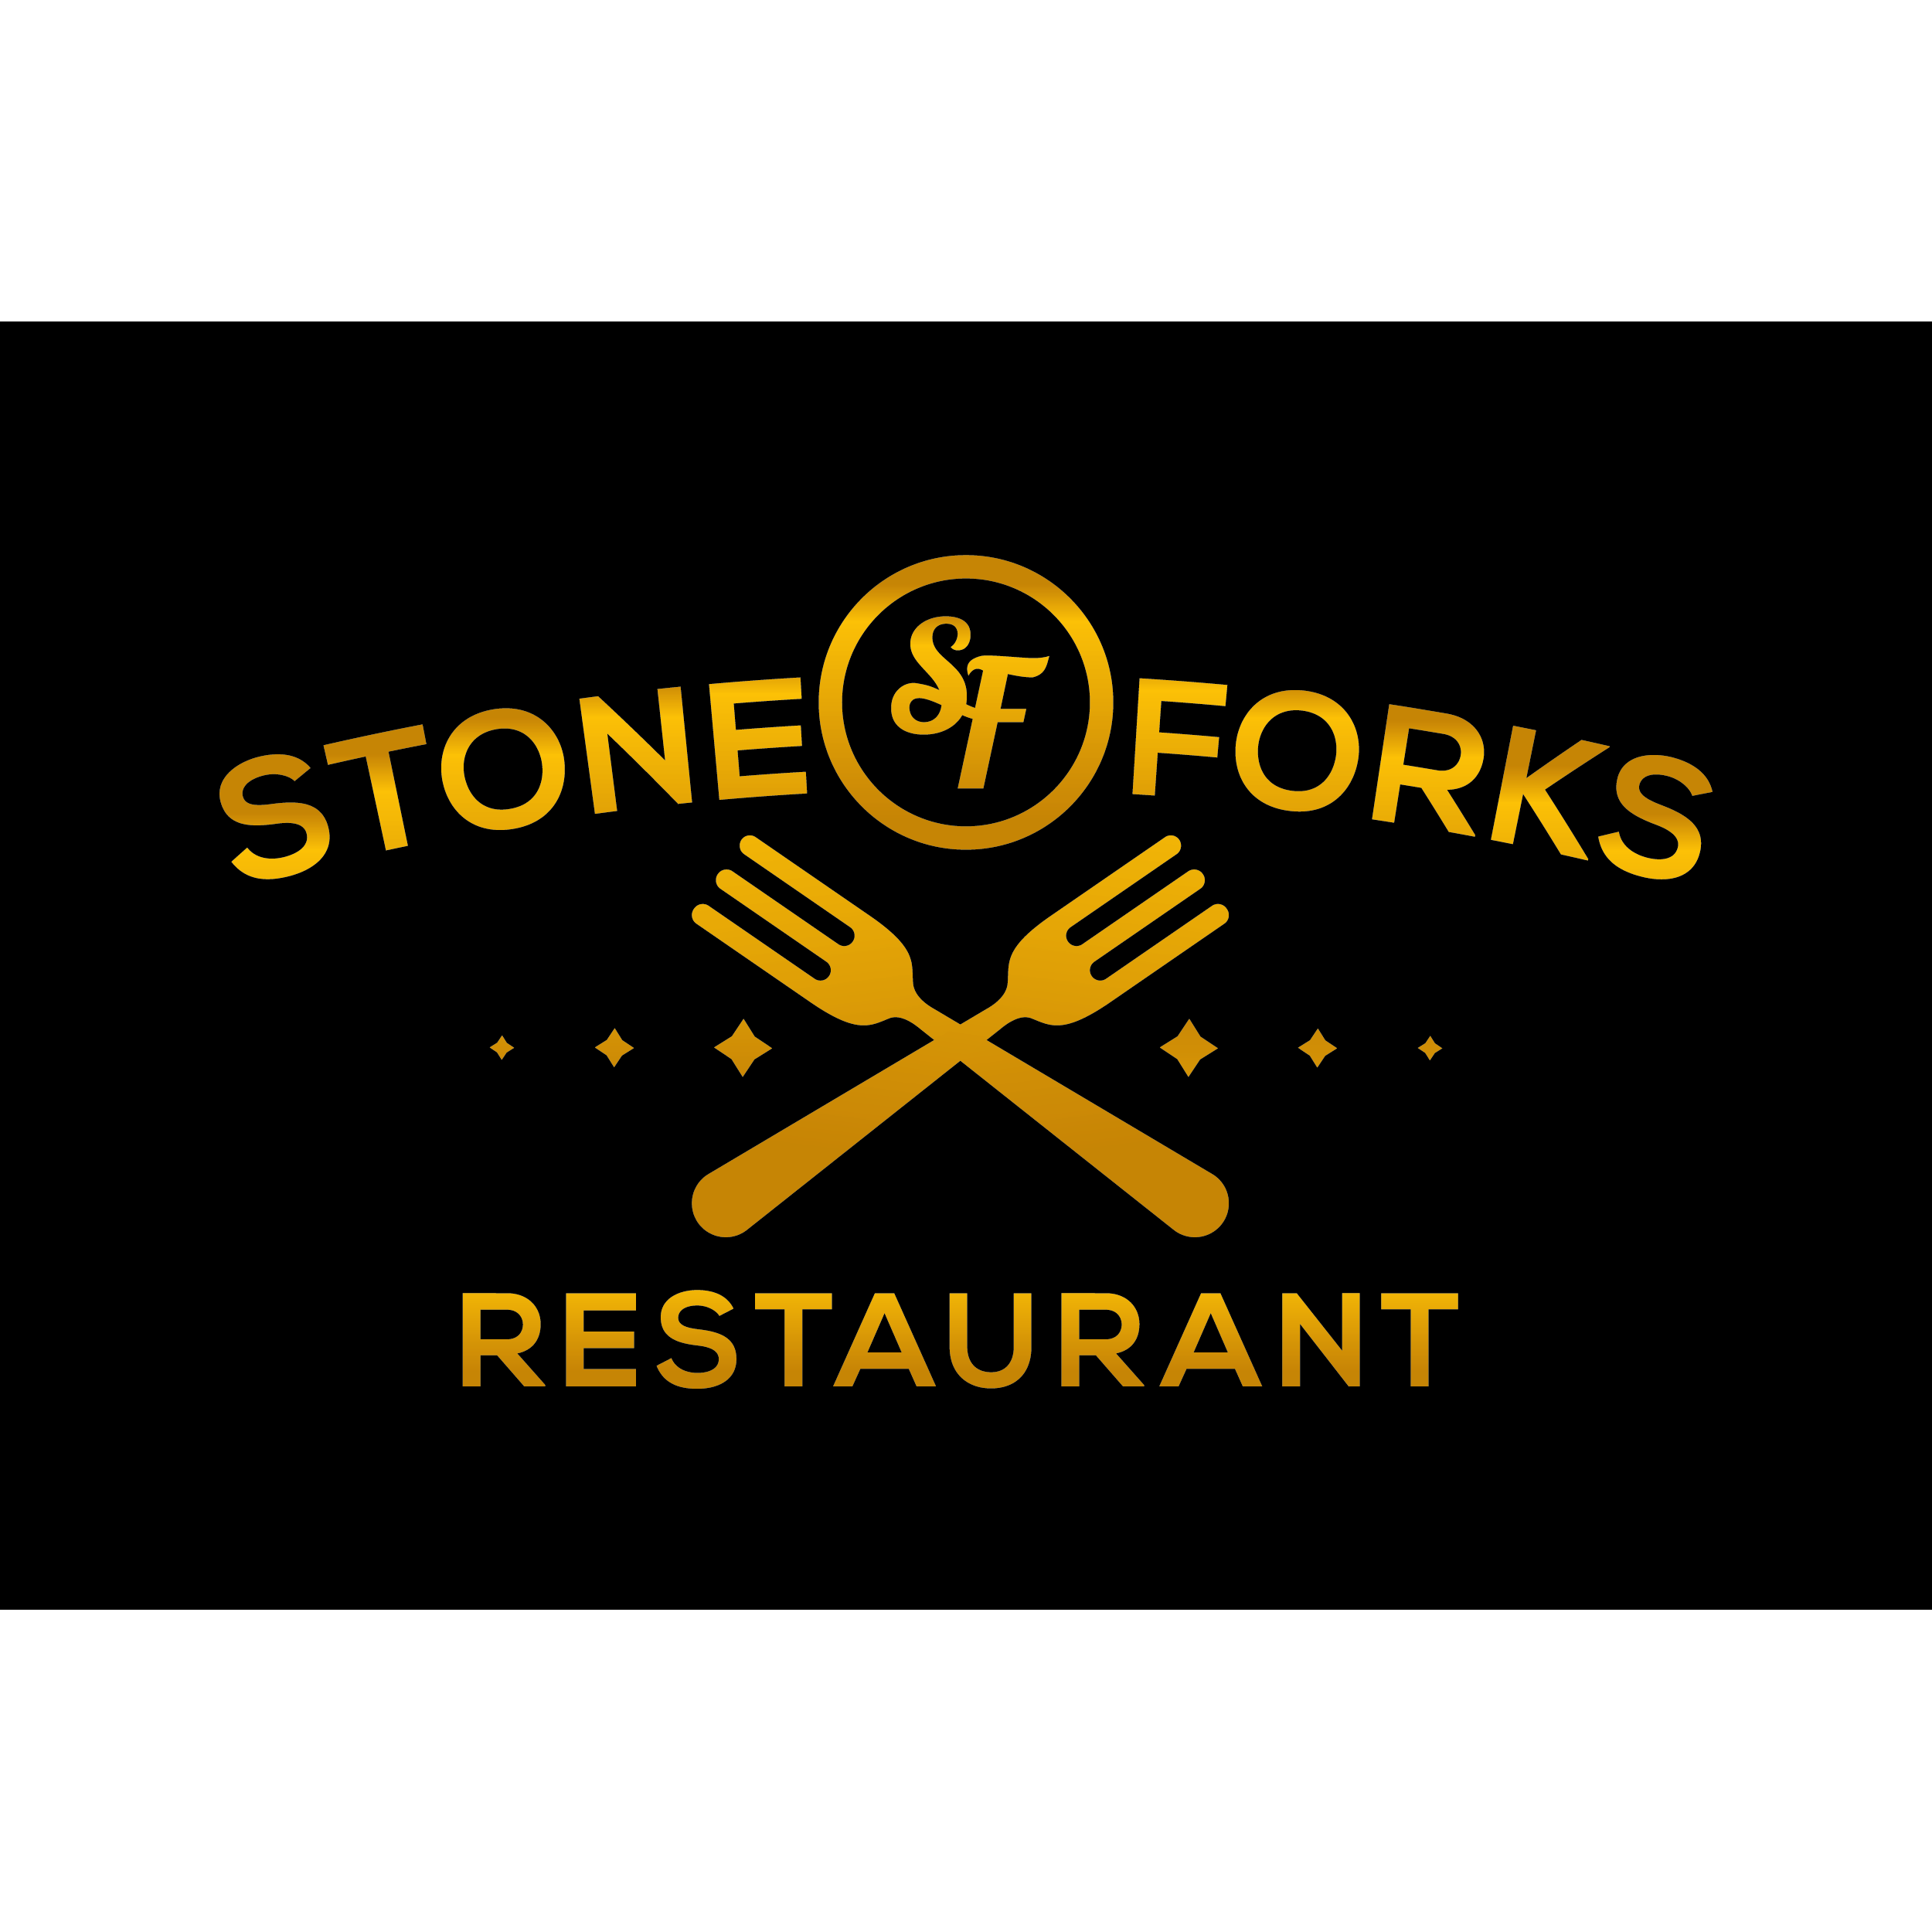 Stone Forks